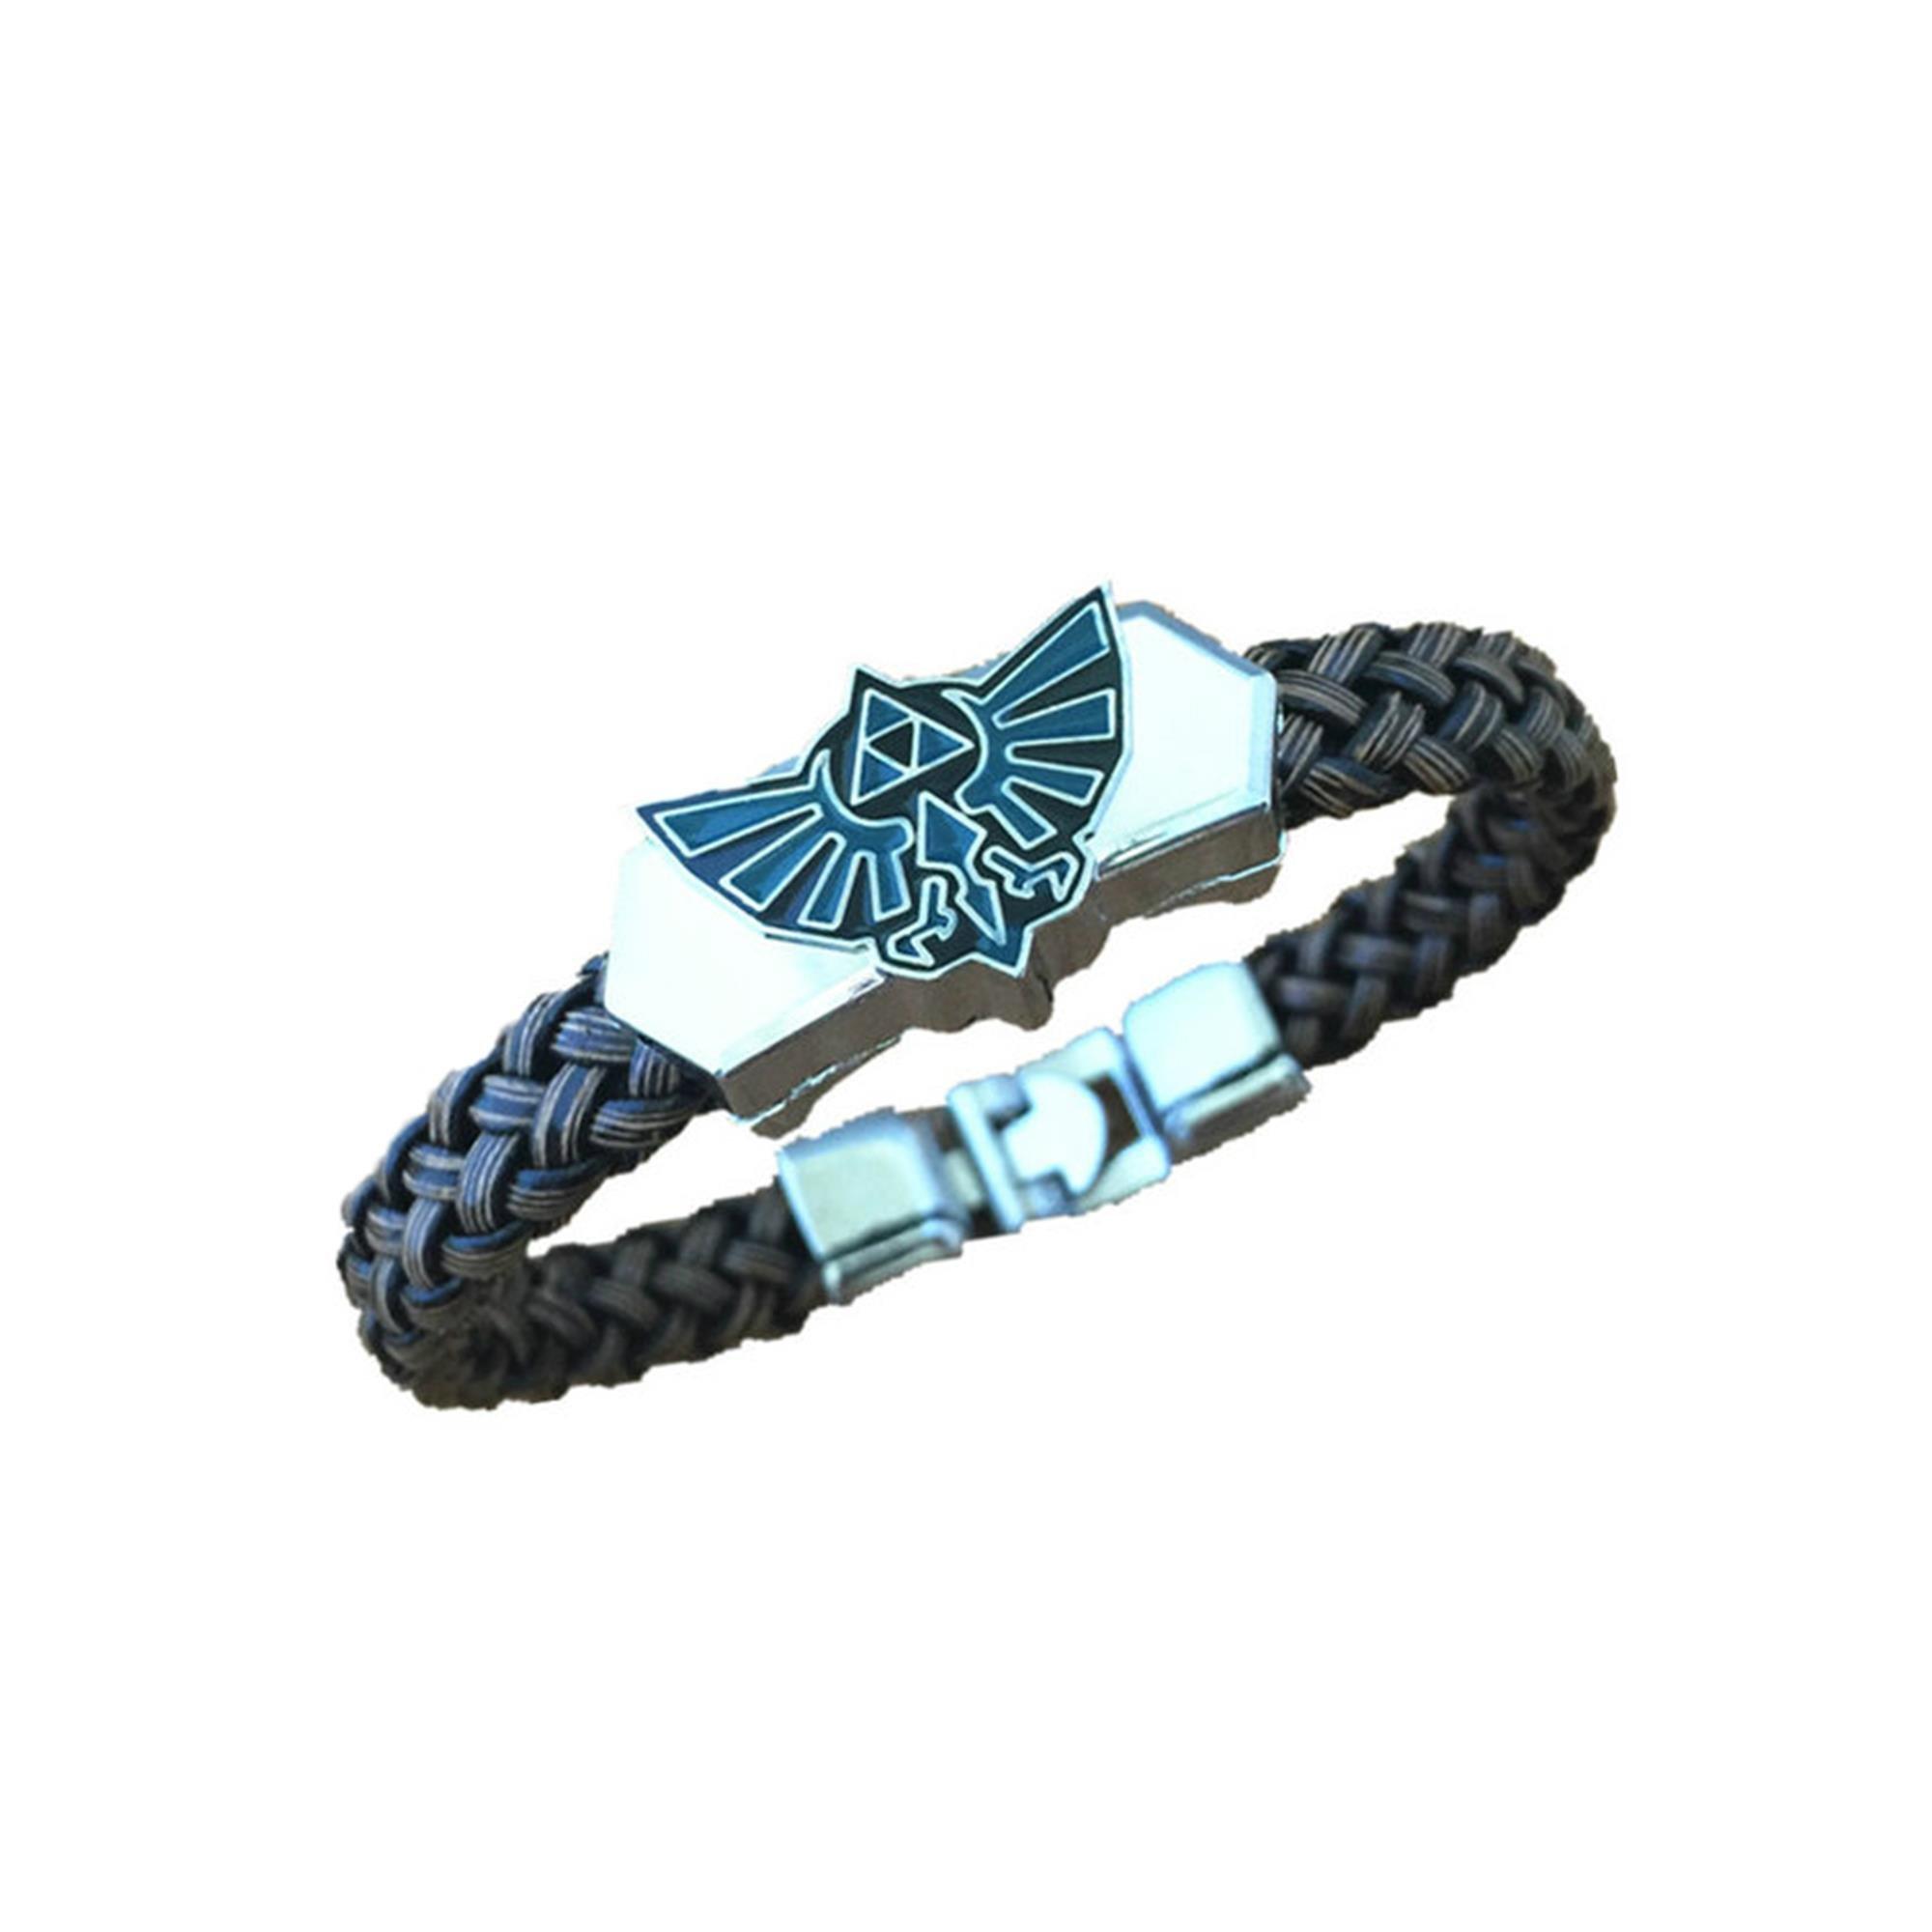 Athena Brand Game Legend of Zelda Logo Leather Braided Bracelet In Gift Box